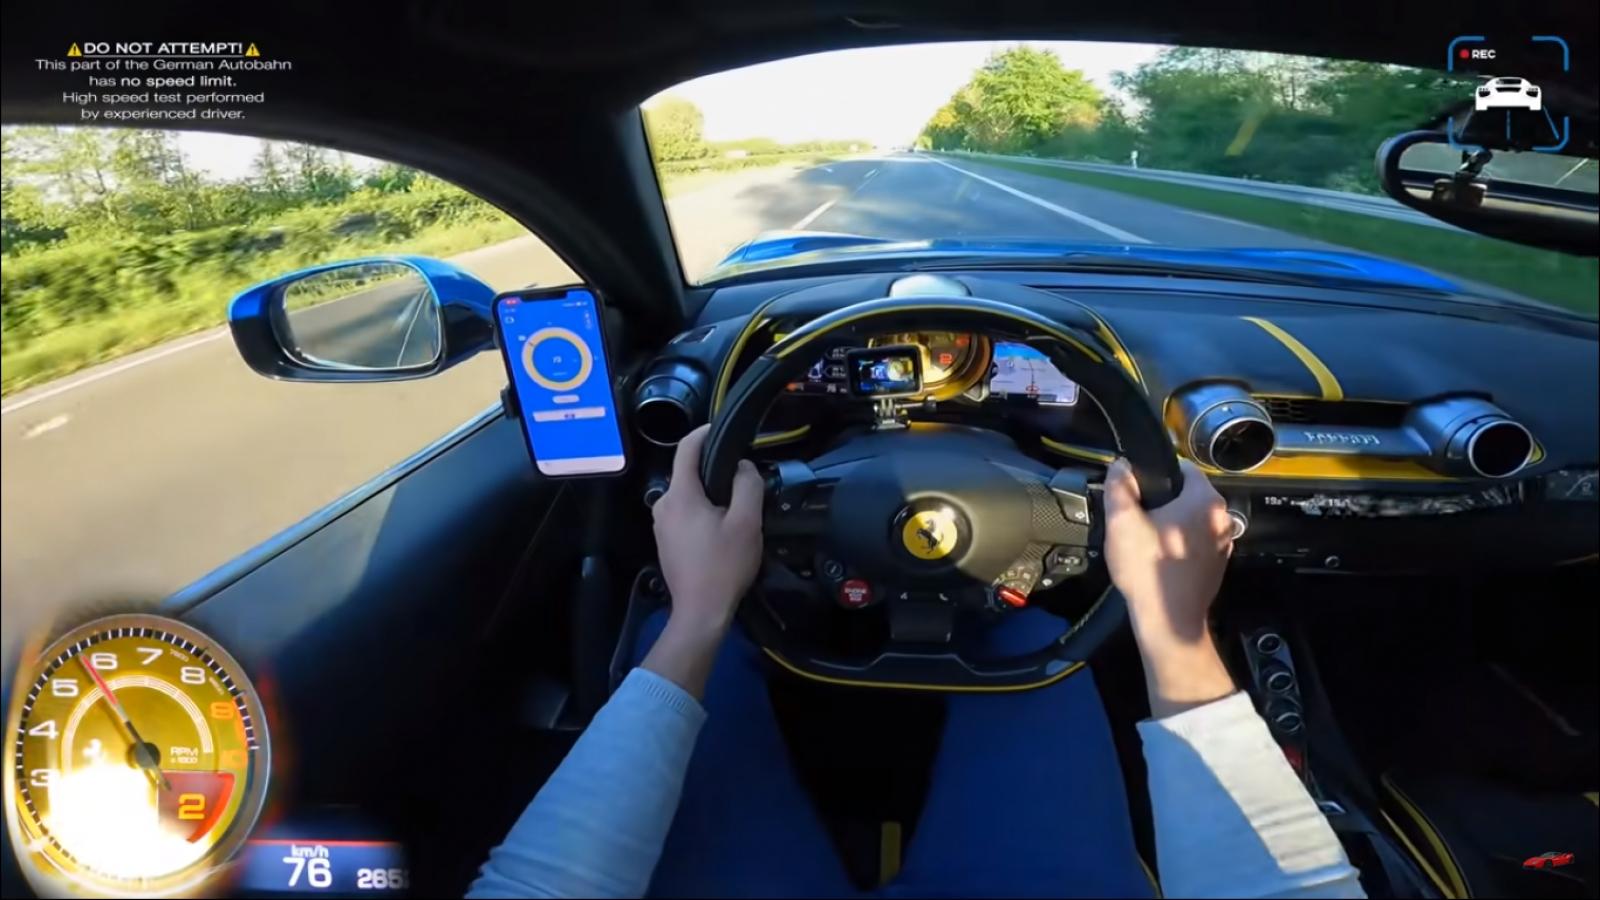 Video trải nghiệm sức mạnh của Ferrari 812 Superfast